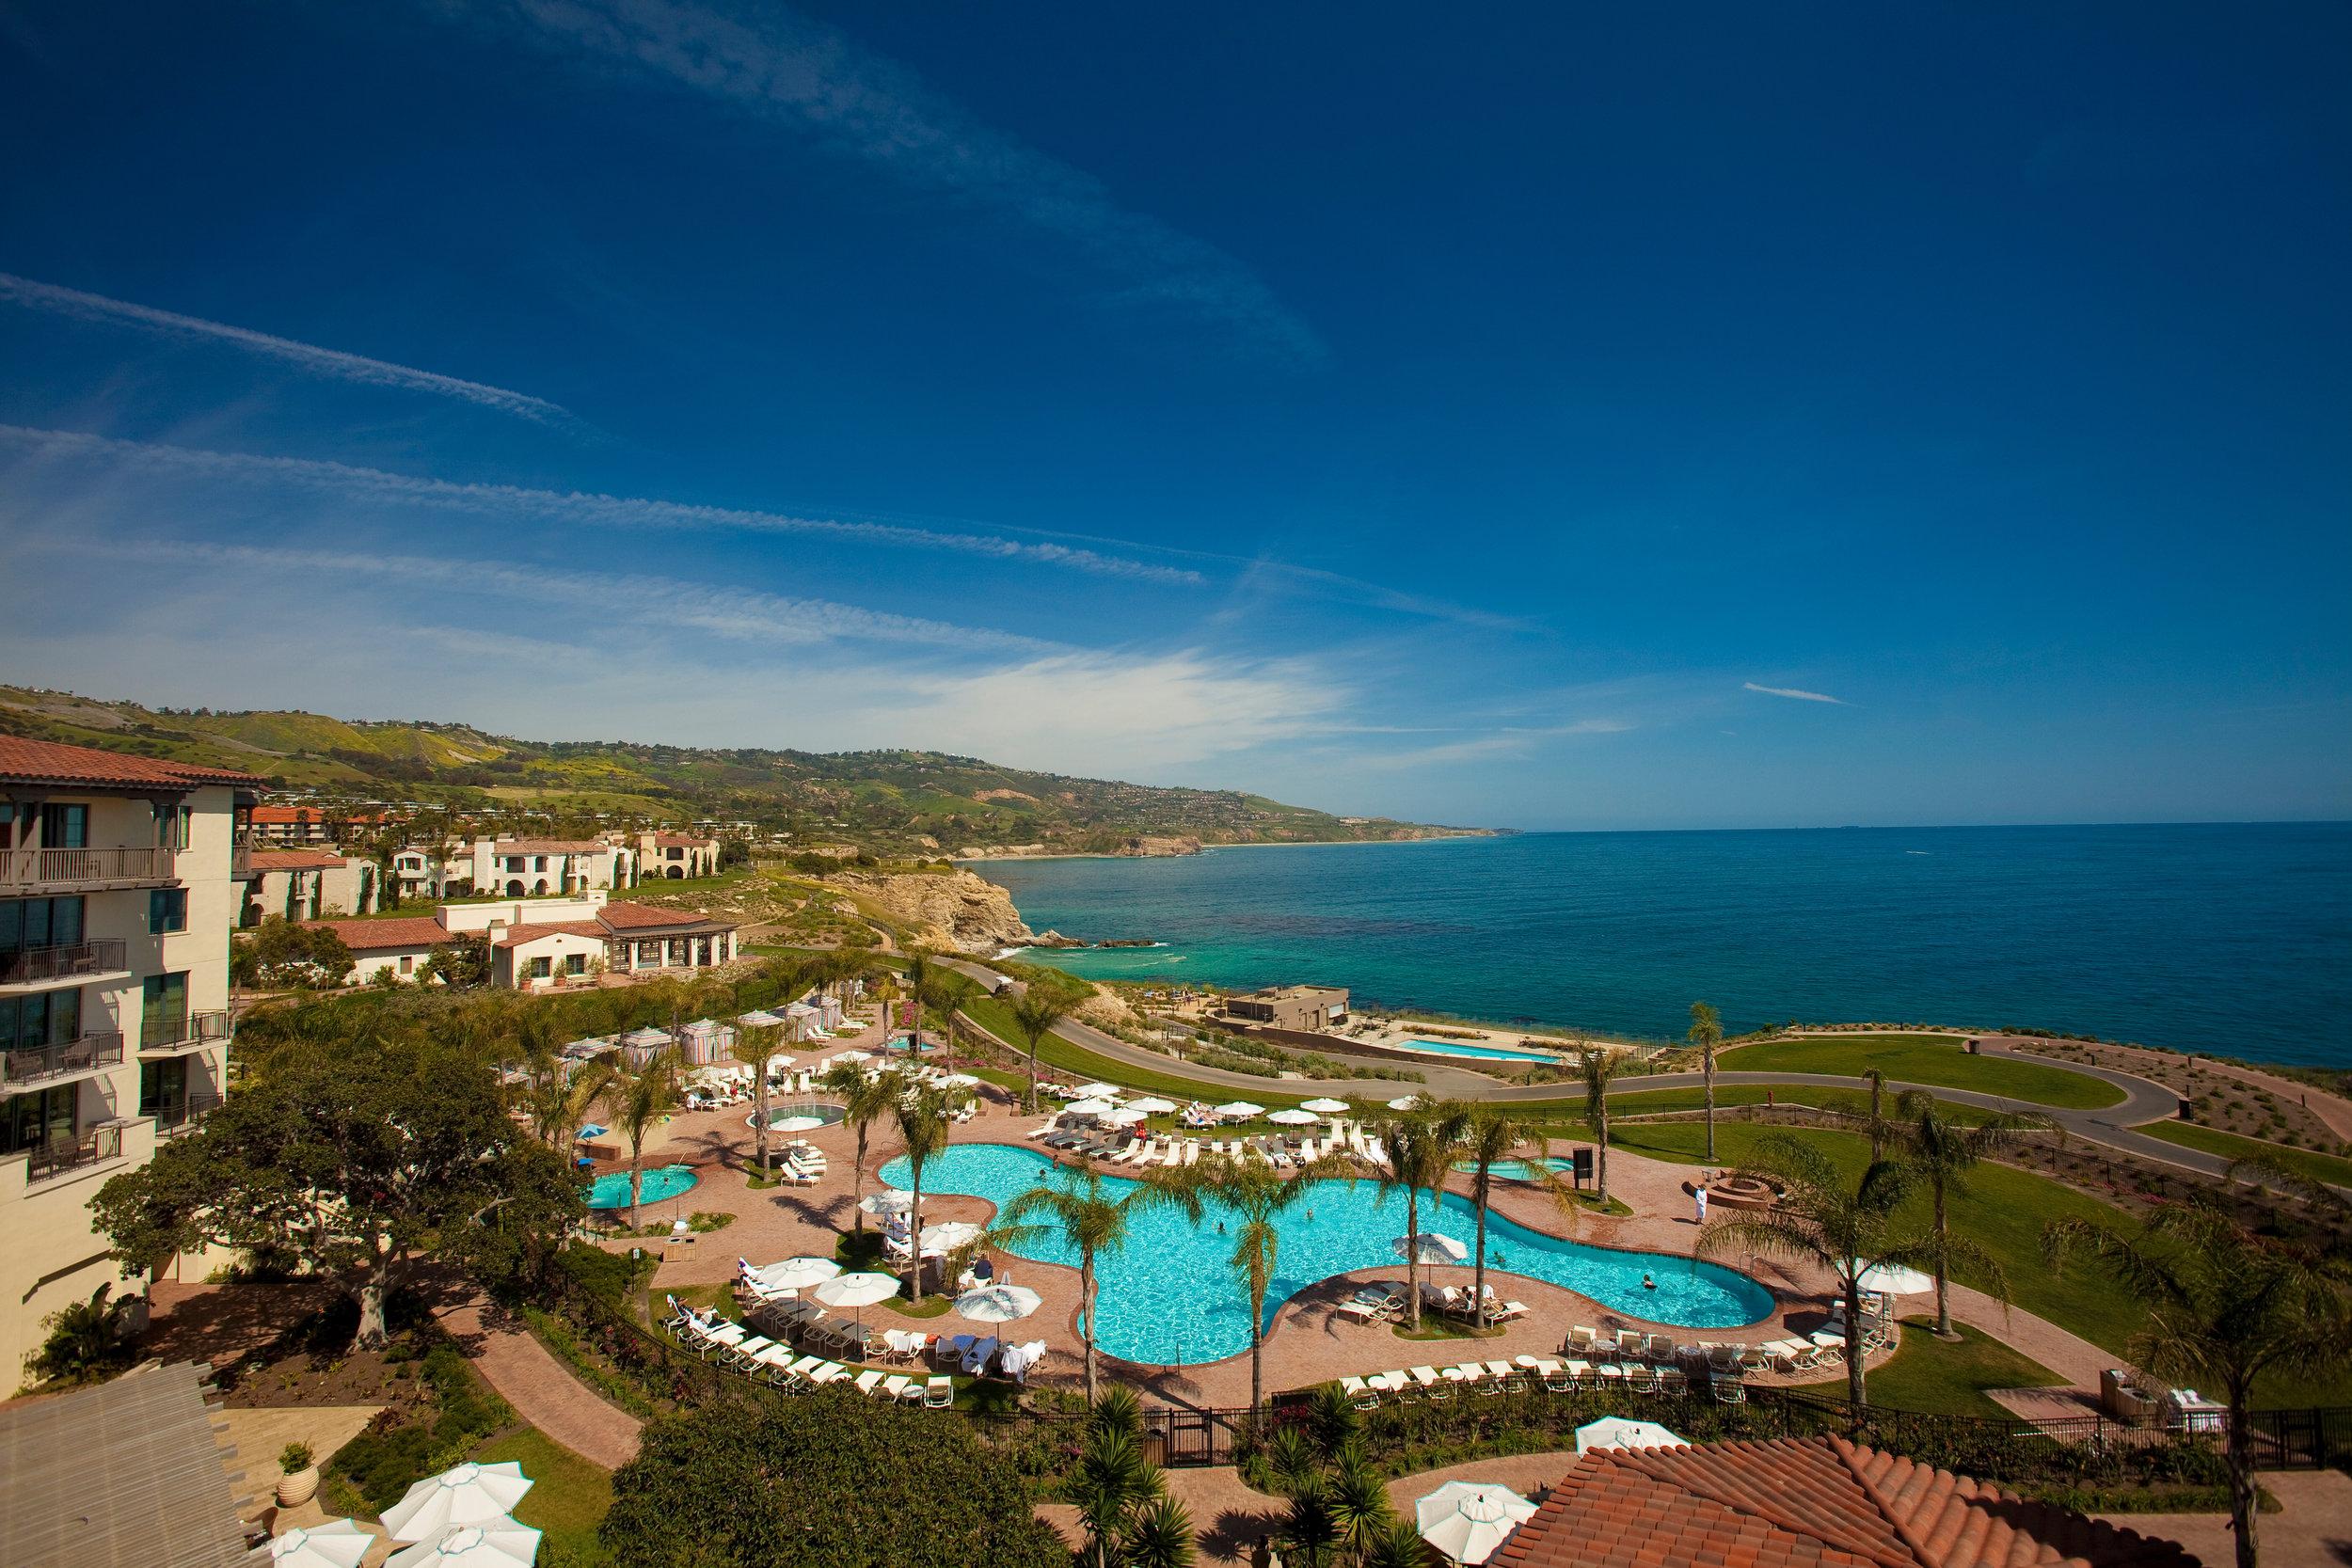 Terranea Resort - Resort Pool.jpg